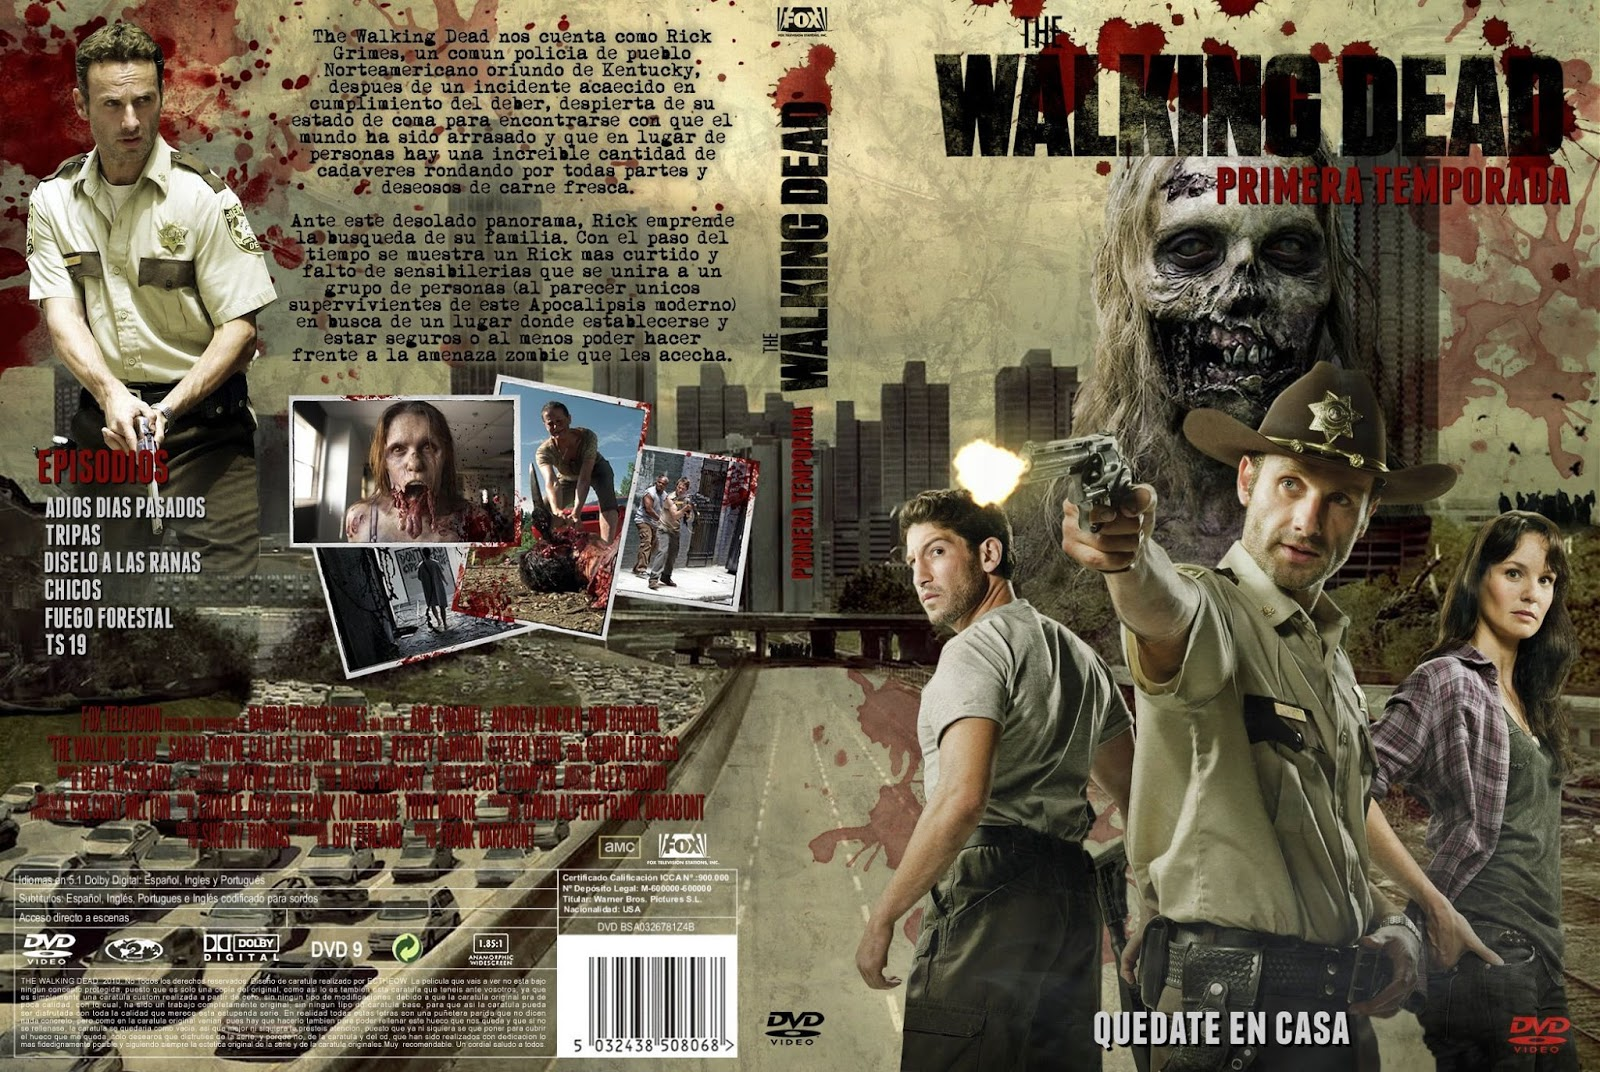 The Walking Dead [Temporada 1] [Latino] [DVD-Rip]